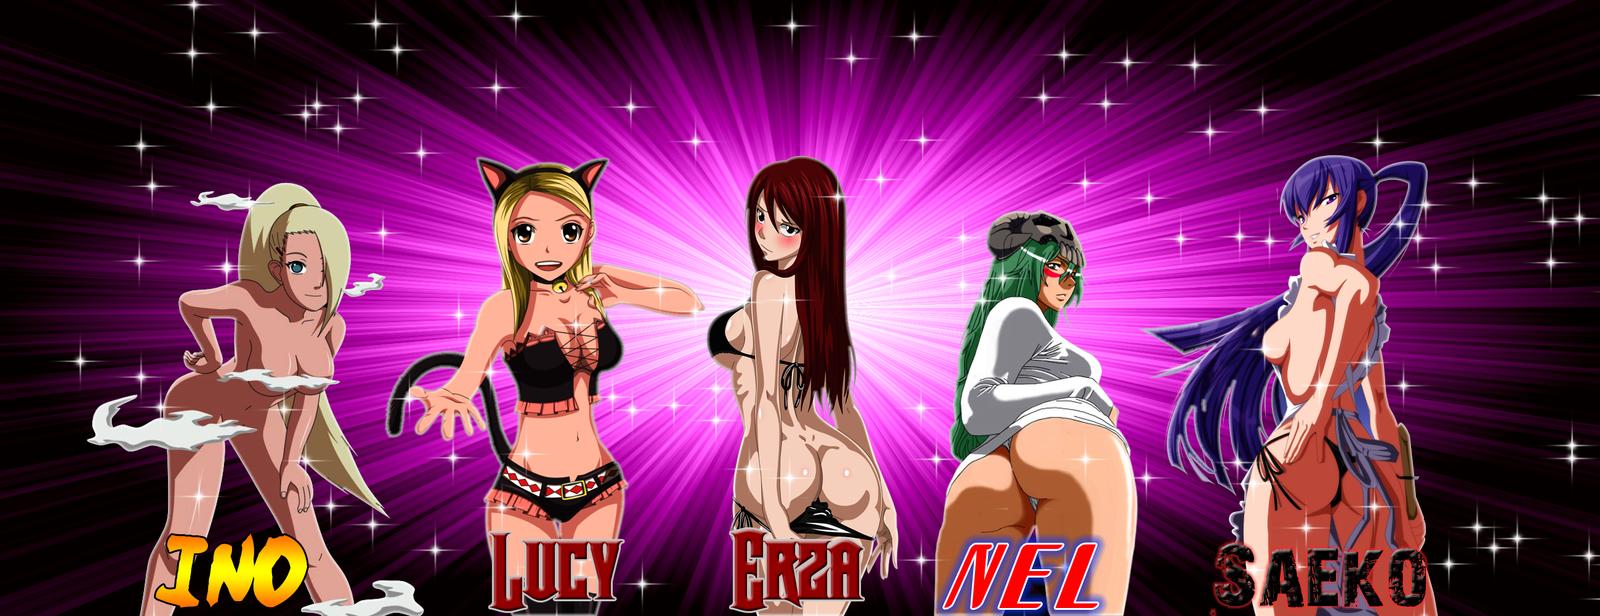 Sexy Anime Divas (who will you choose) by thekusanagi1